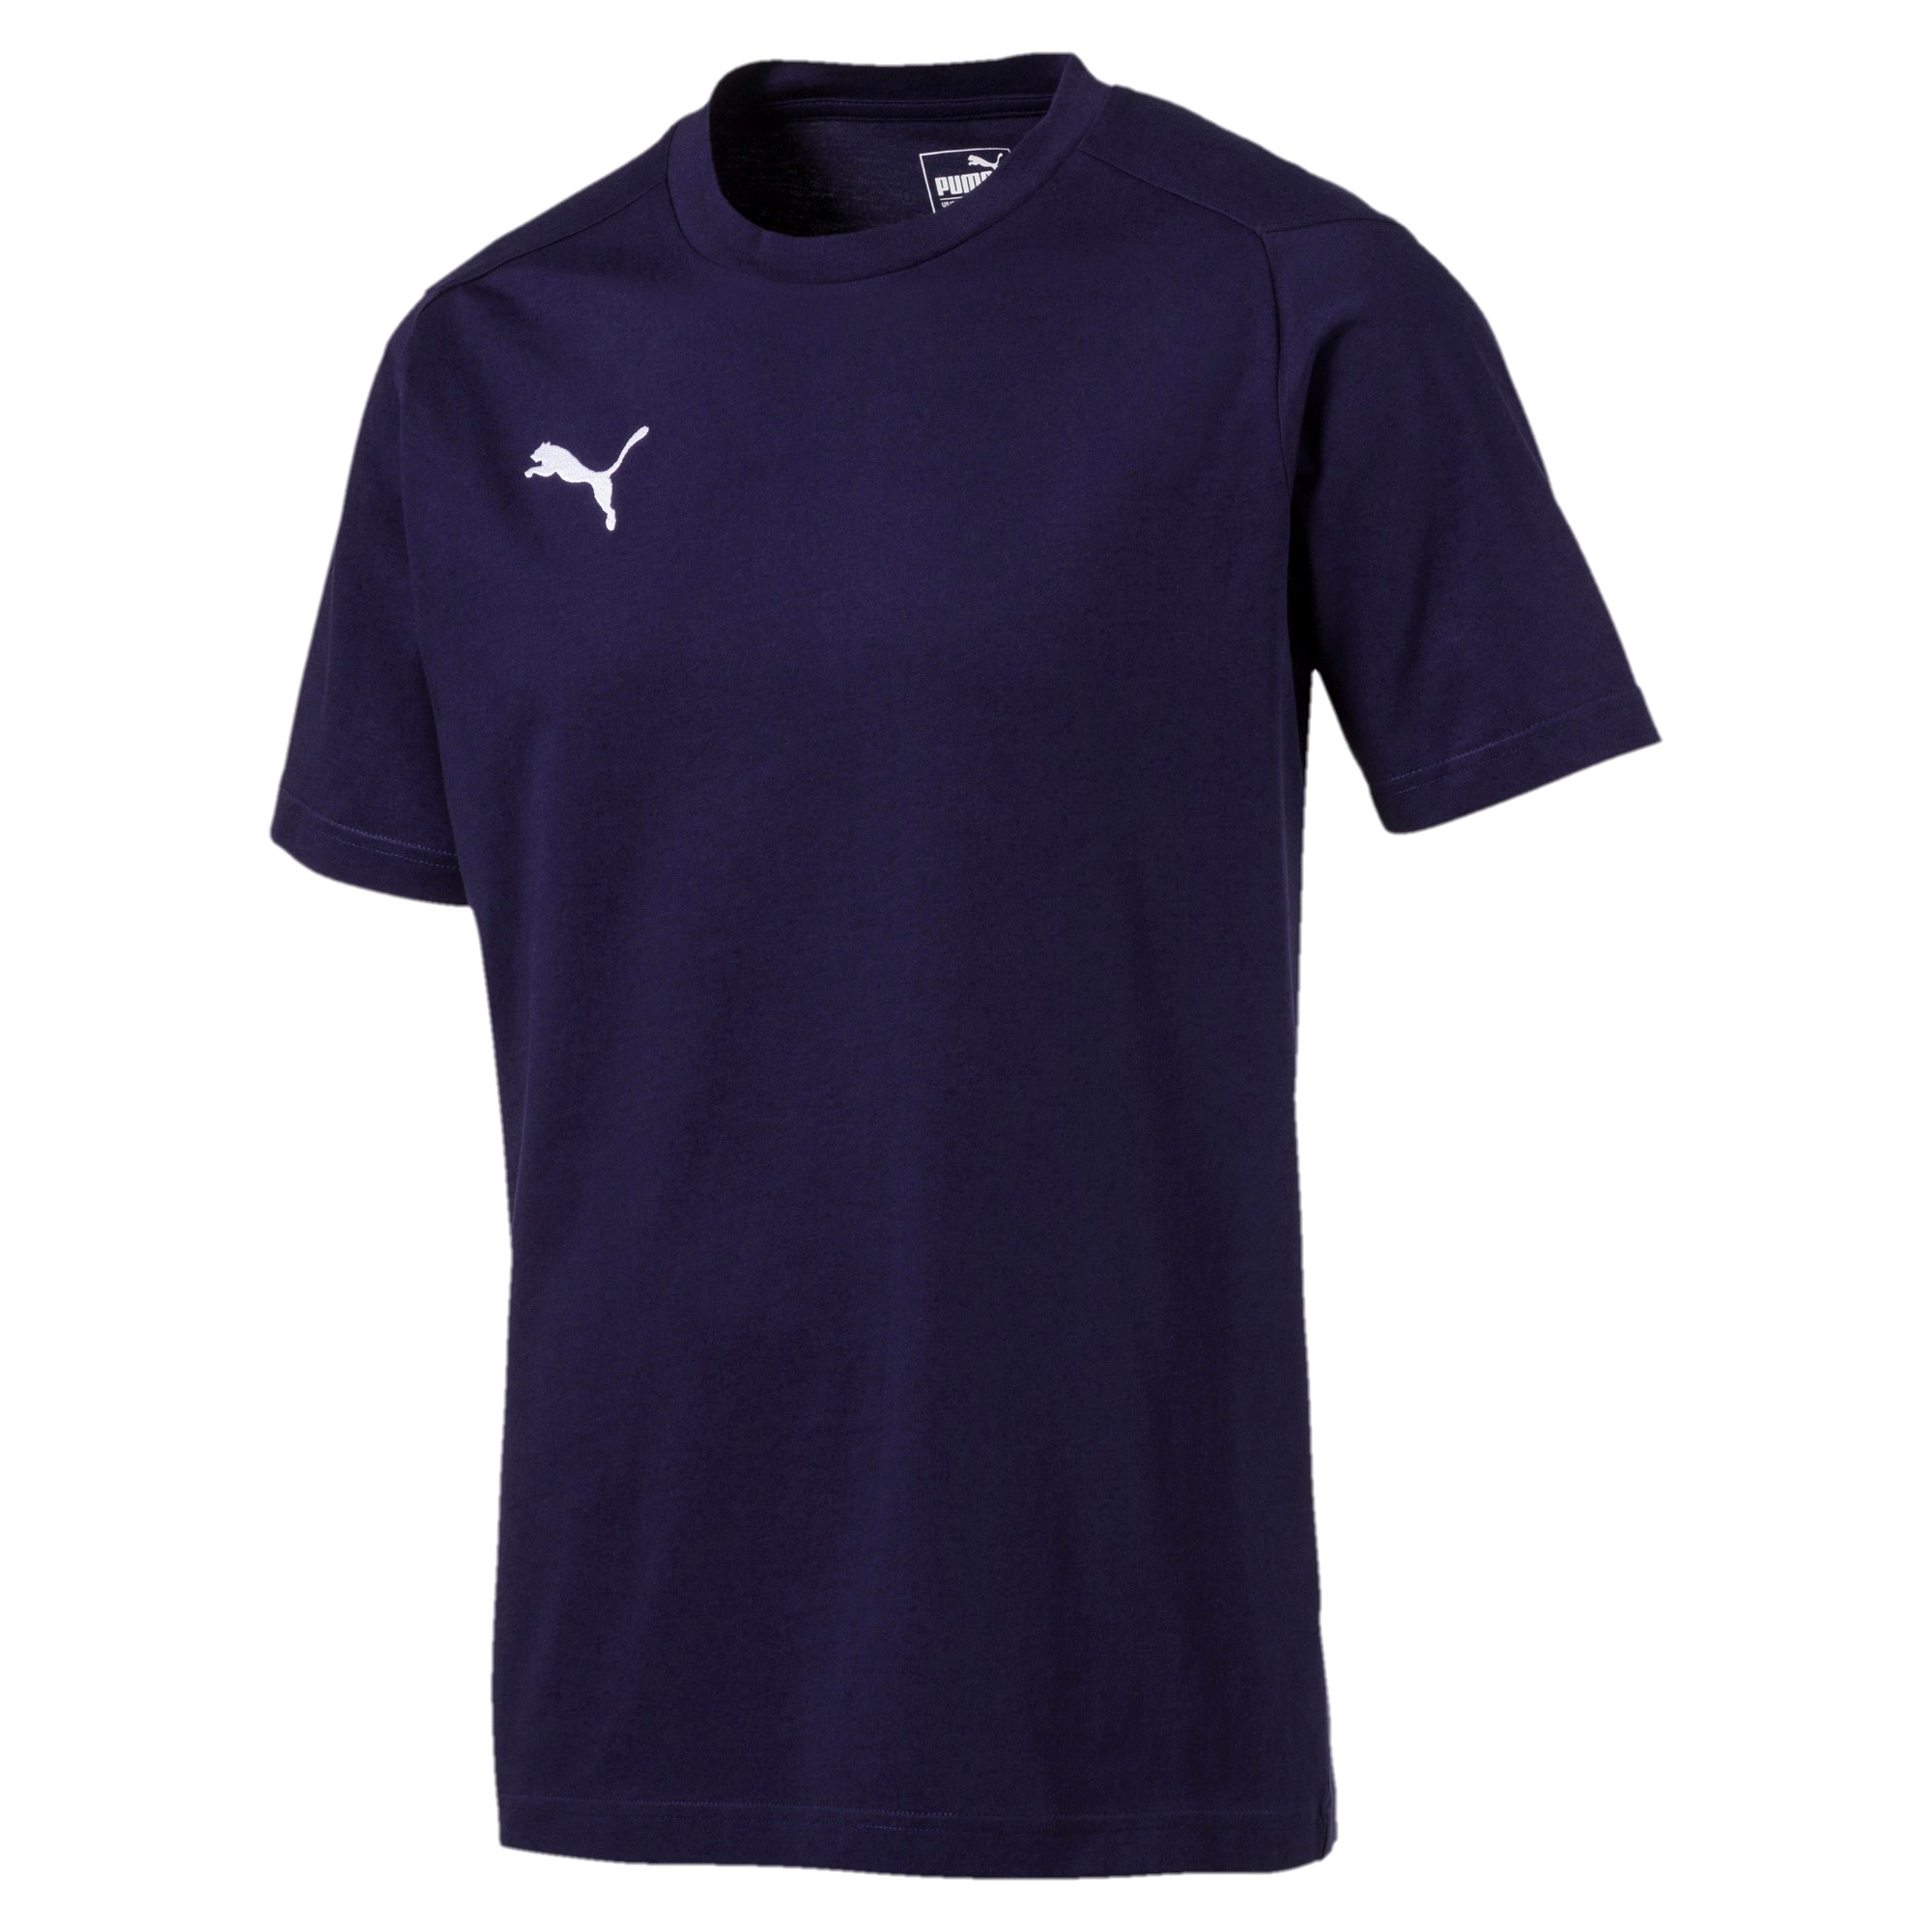 Ligua Casual T-shirt Blue